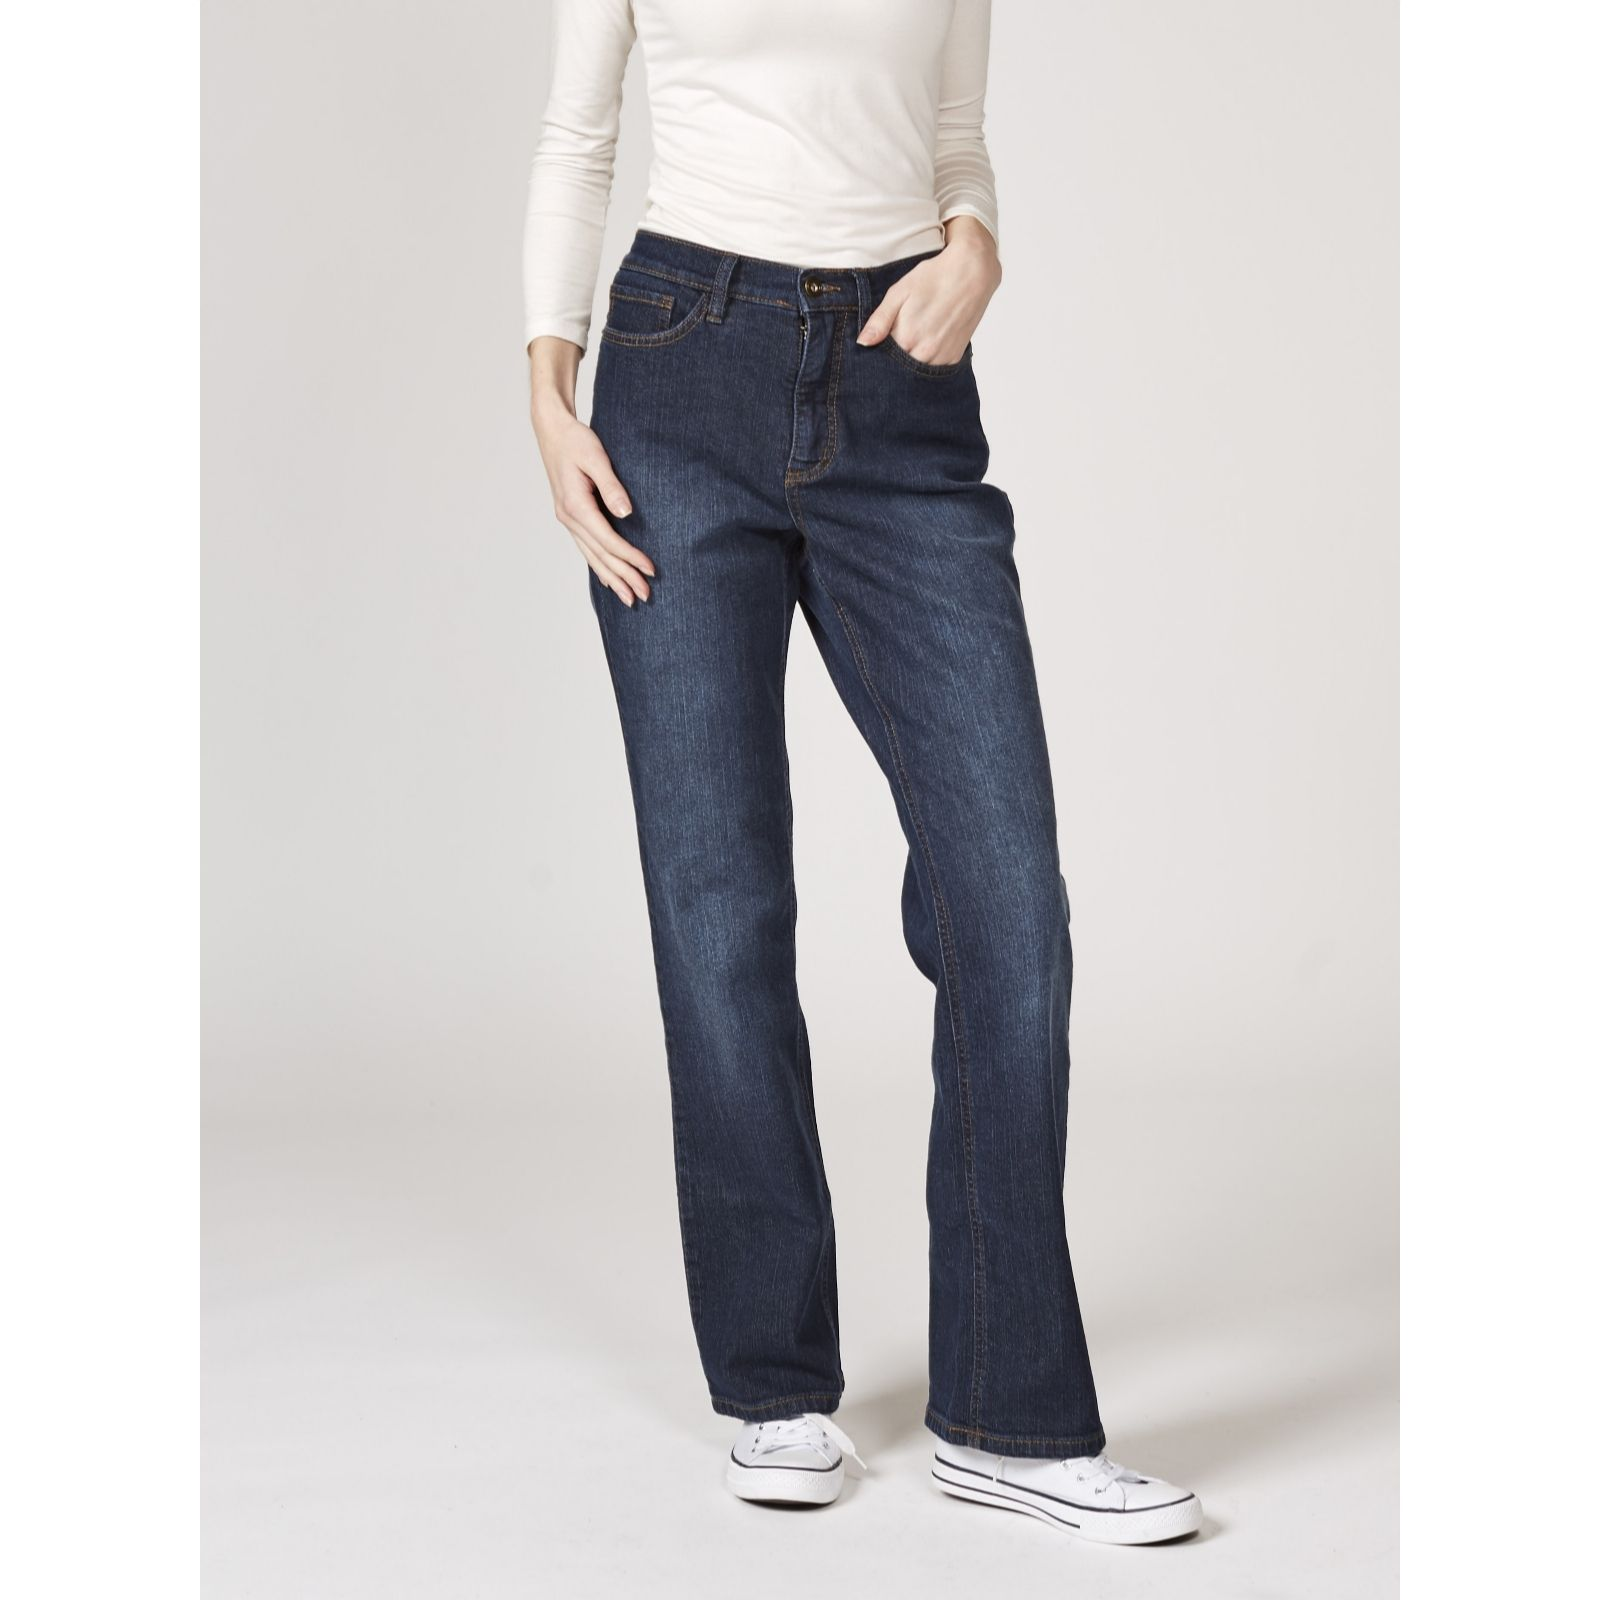 Men's Clothing Confident Jeans & Co Clothing, Shoes & Accessories